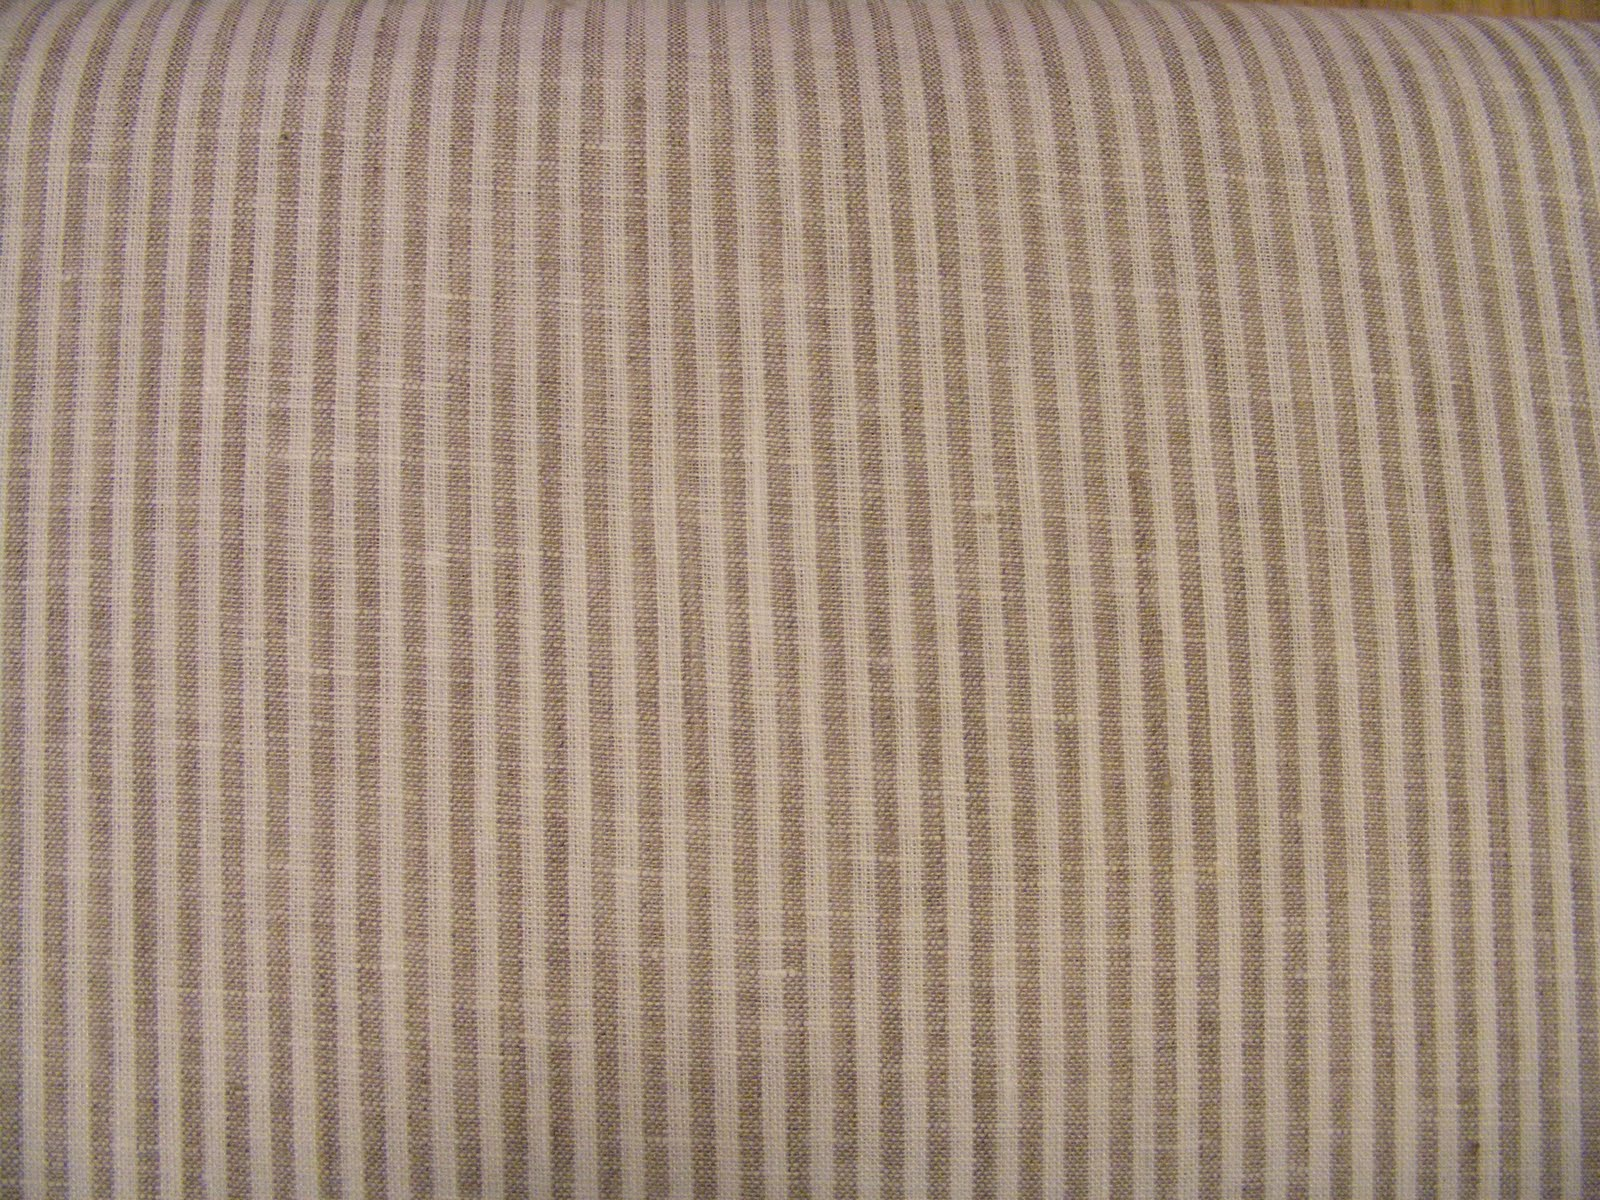 bessones tienda online lino gris. Black Bedroom Furniture Sets. Home Design Ideas